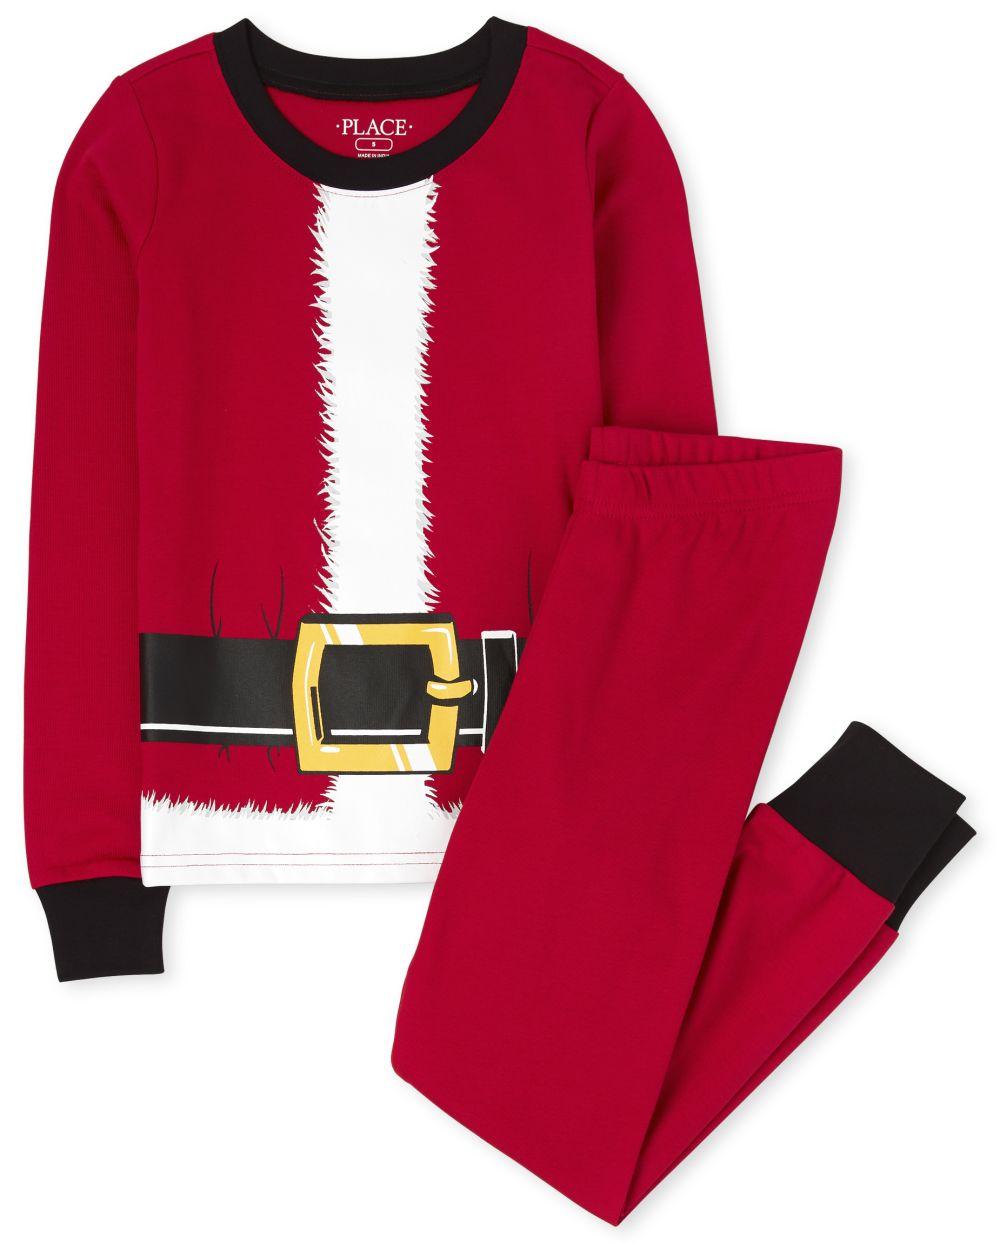 Unisex Kids Matching Family Santa Suit Snug Fit Cotton Pajamas